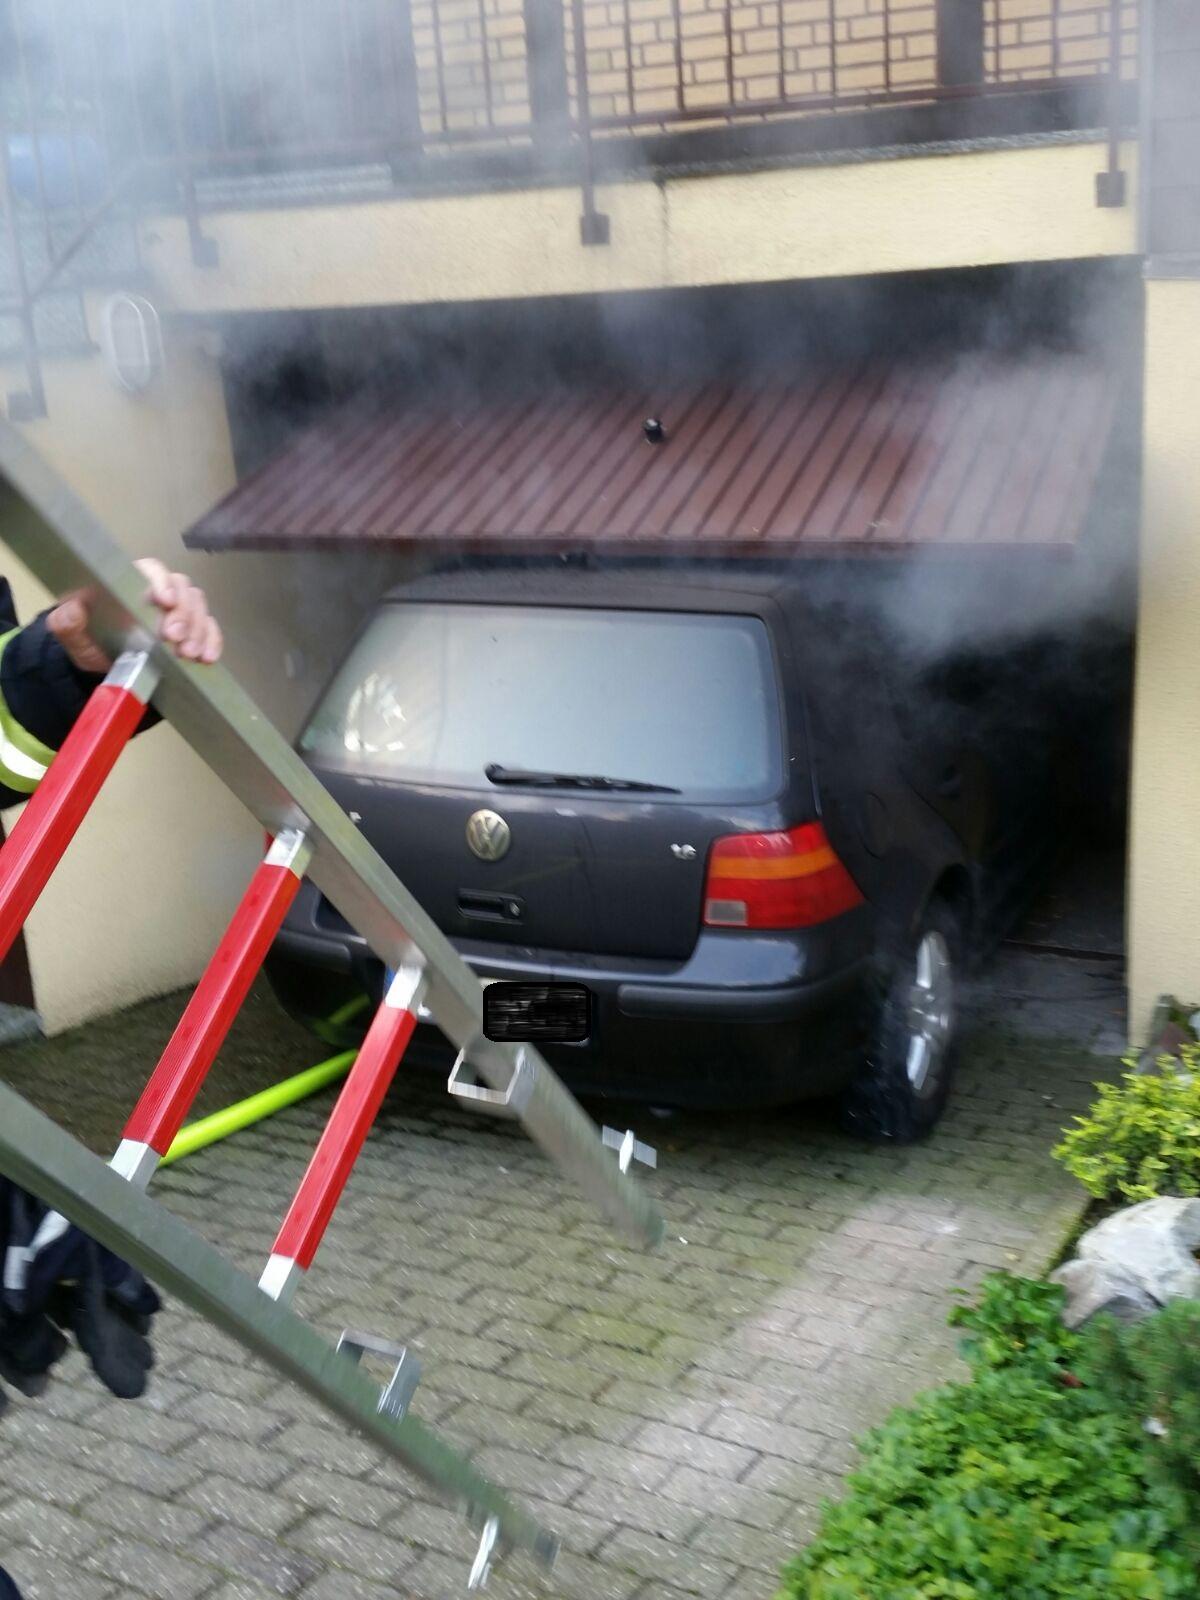 Brennender PKW in Garage  (Foto: OTS)